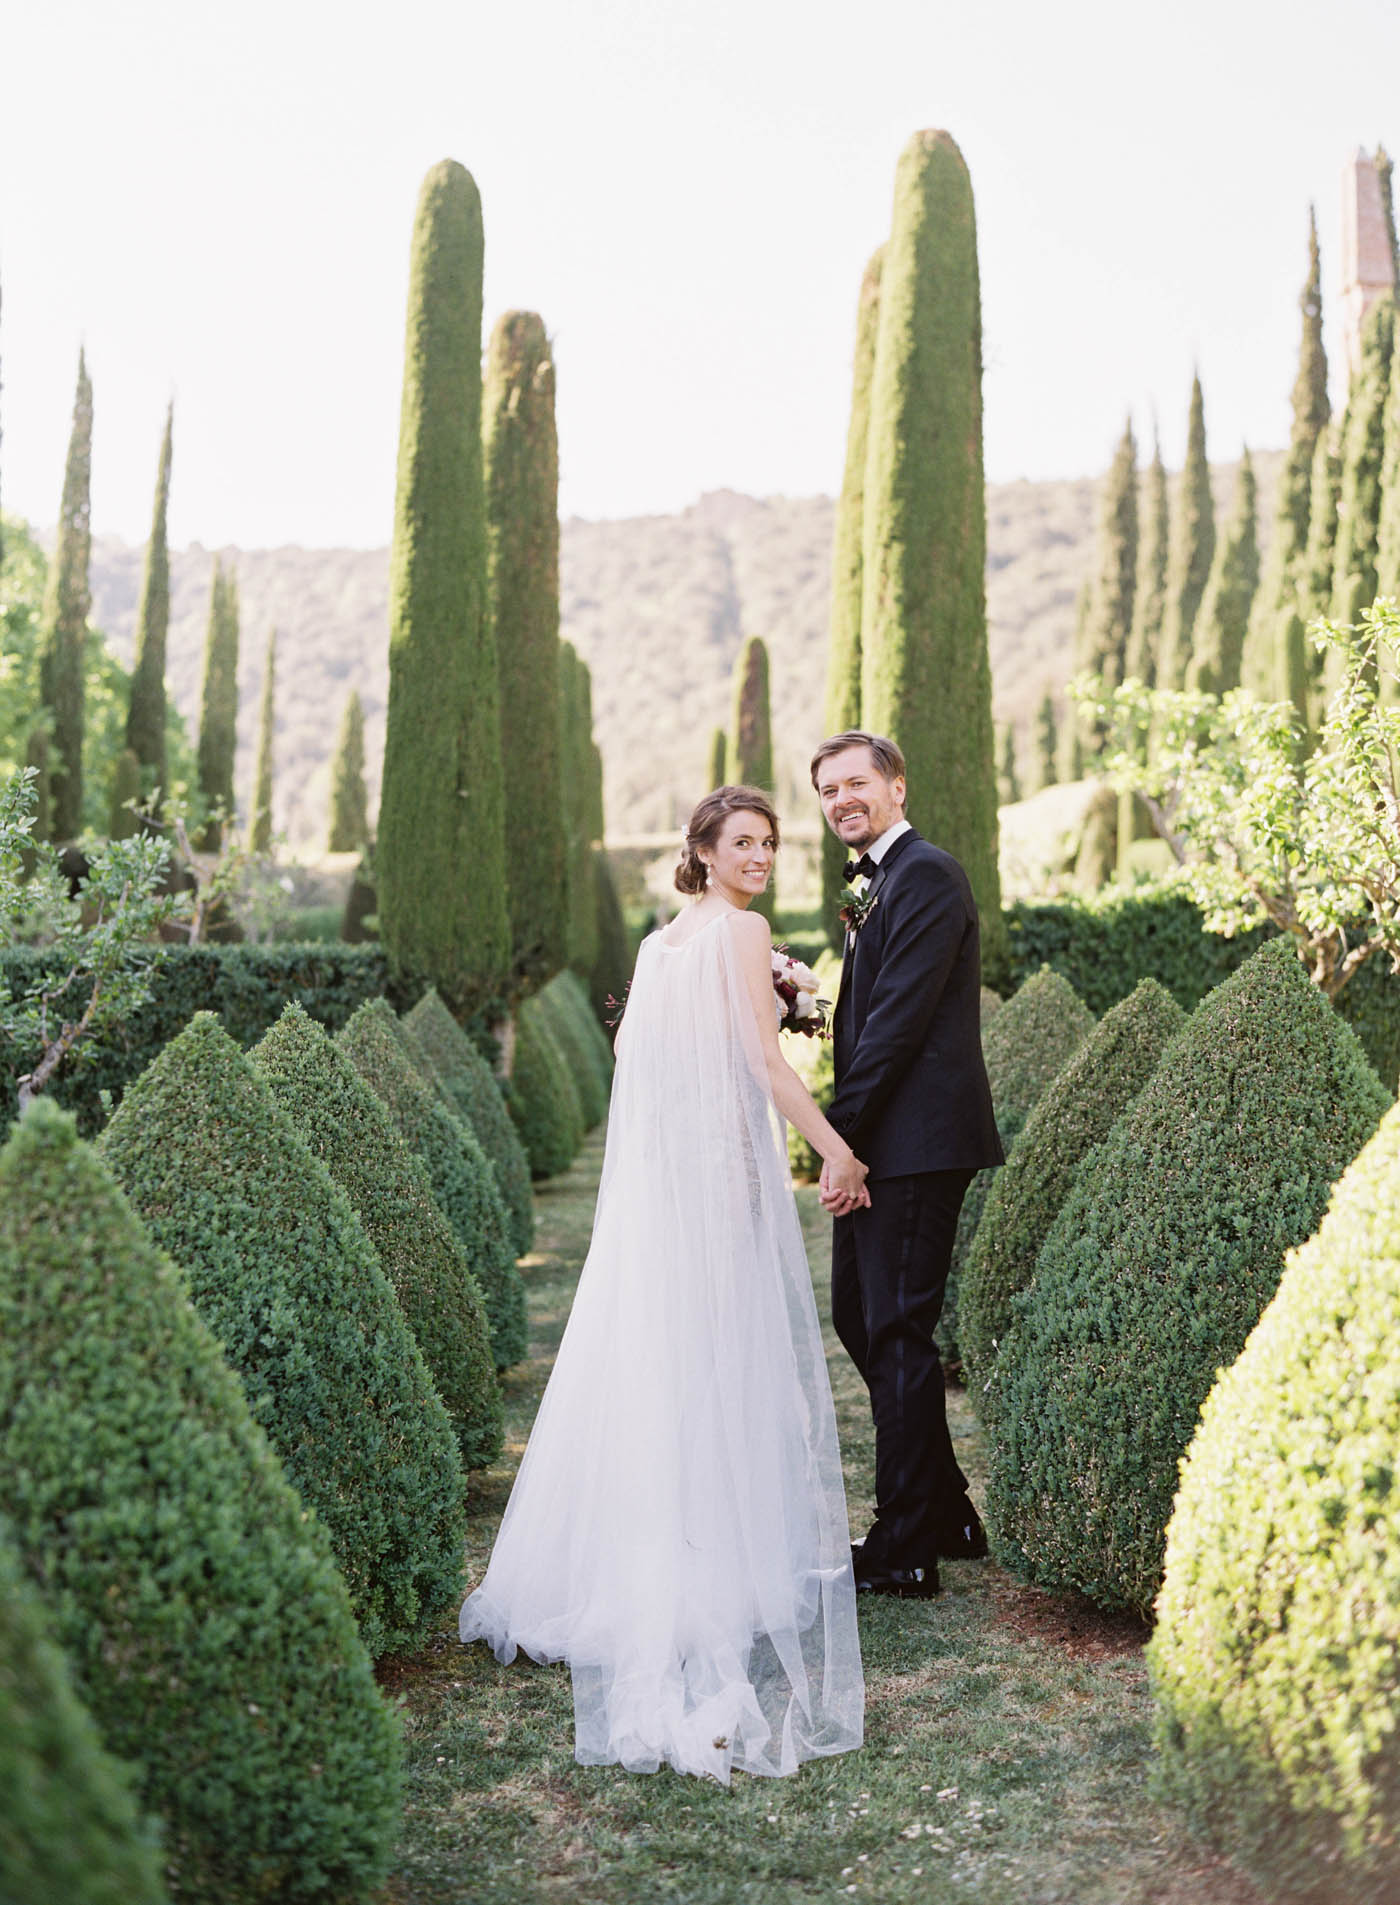 Villa_Cetinale_Wedding-39-Jen_Huang-ElanJacob-258-Jen_Huang-007316-R1-010.jpg